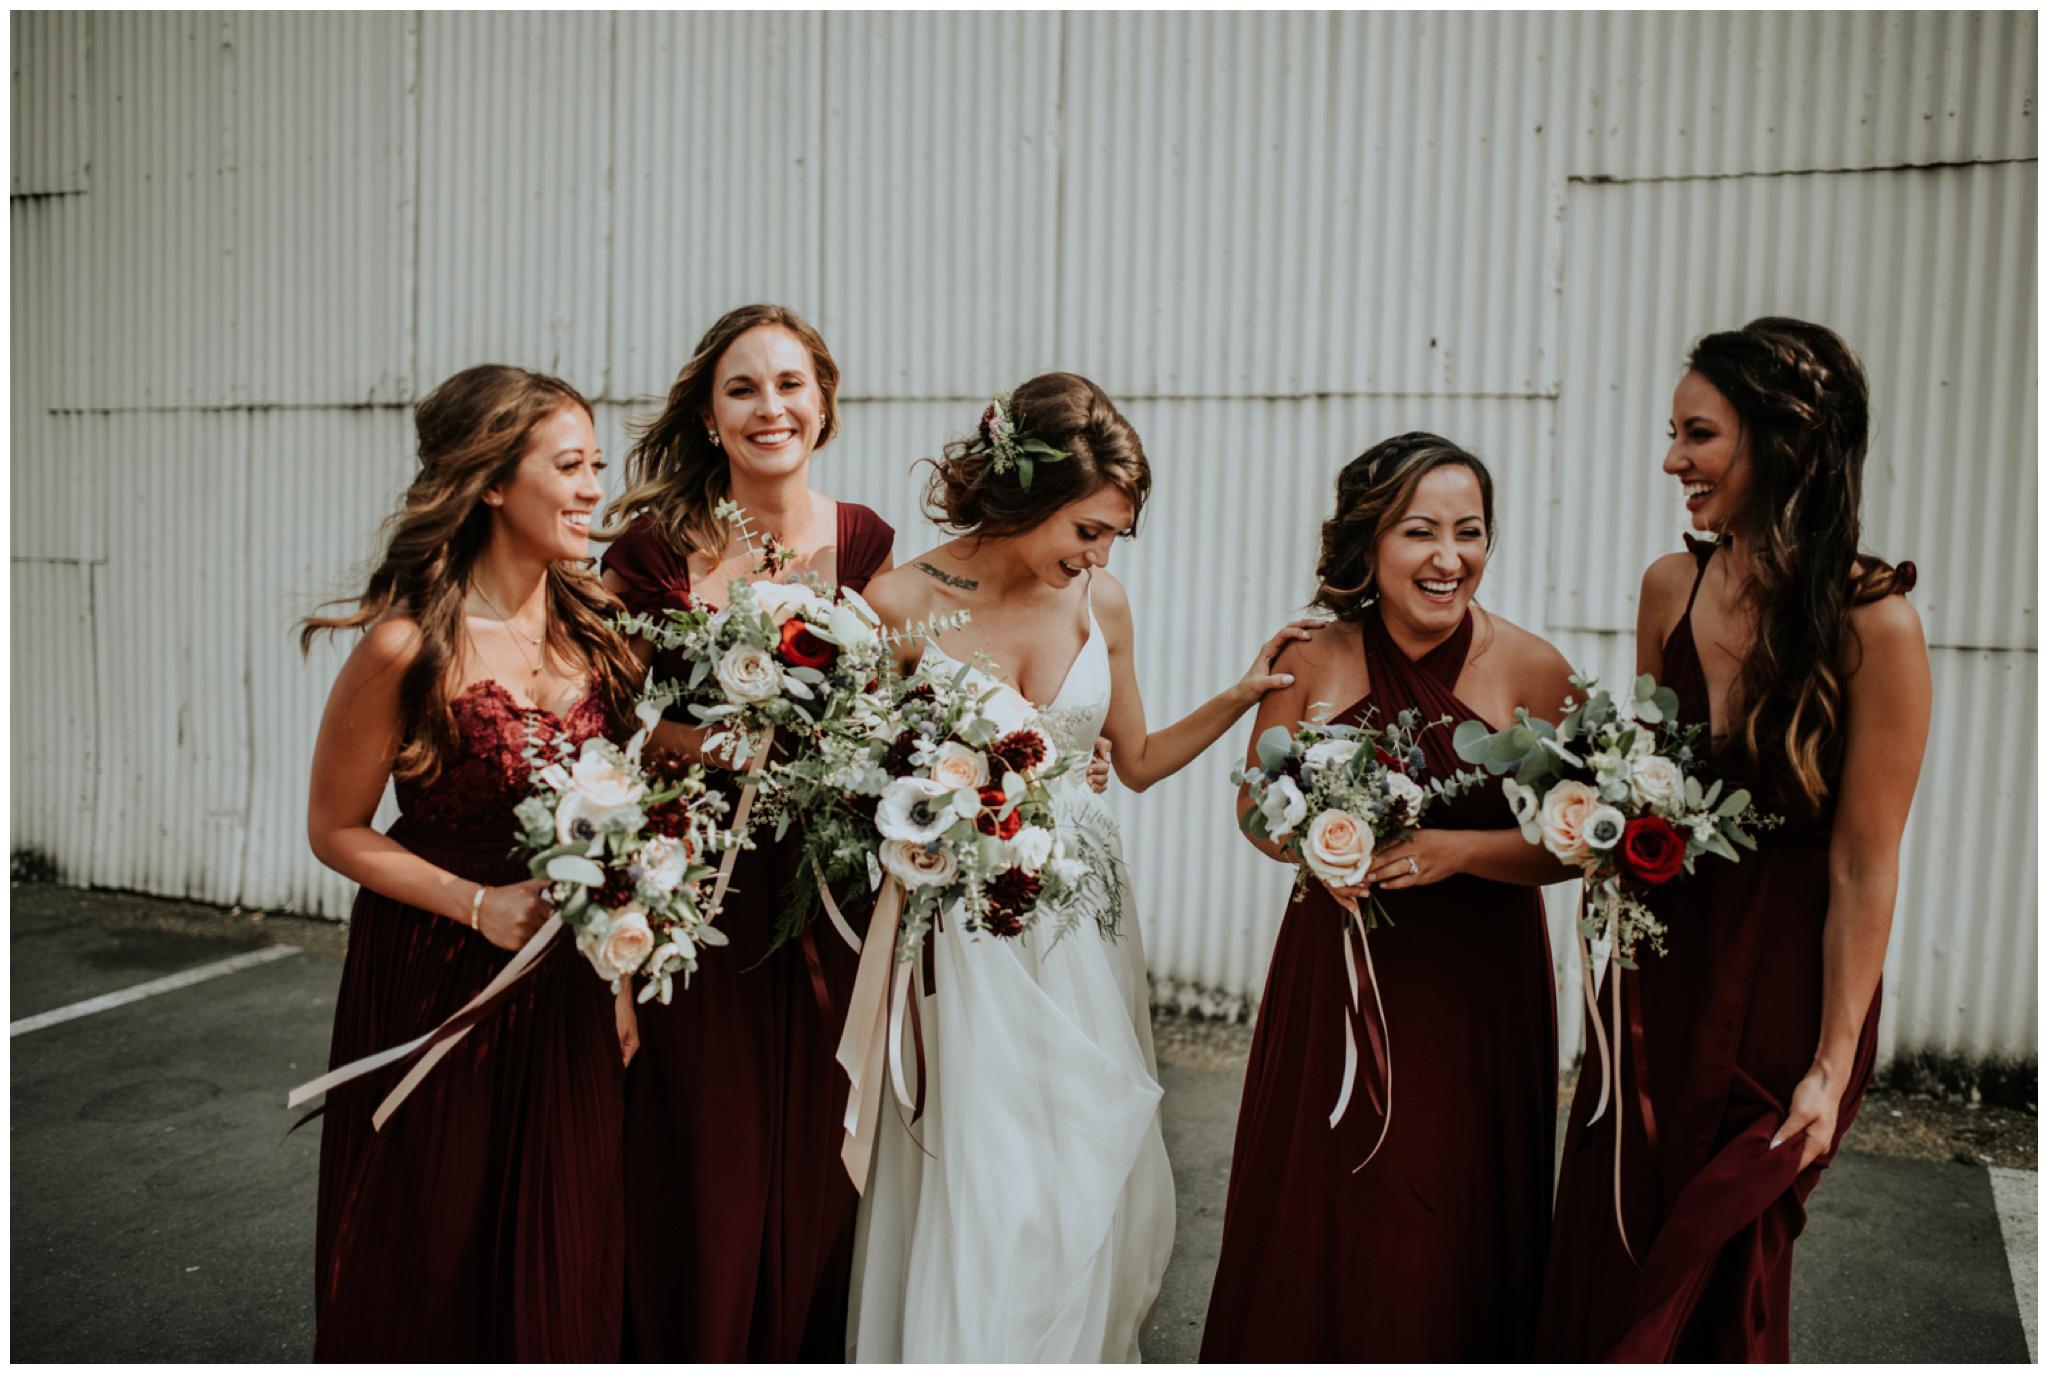 alyssa-keiran-westland-distillery-urban-seattle-wedding-photographer-caitlyn-nikula-87.jpg